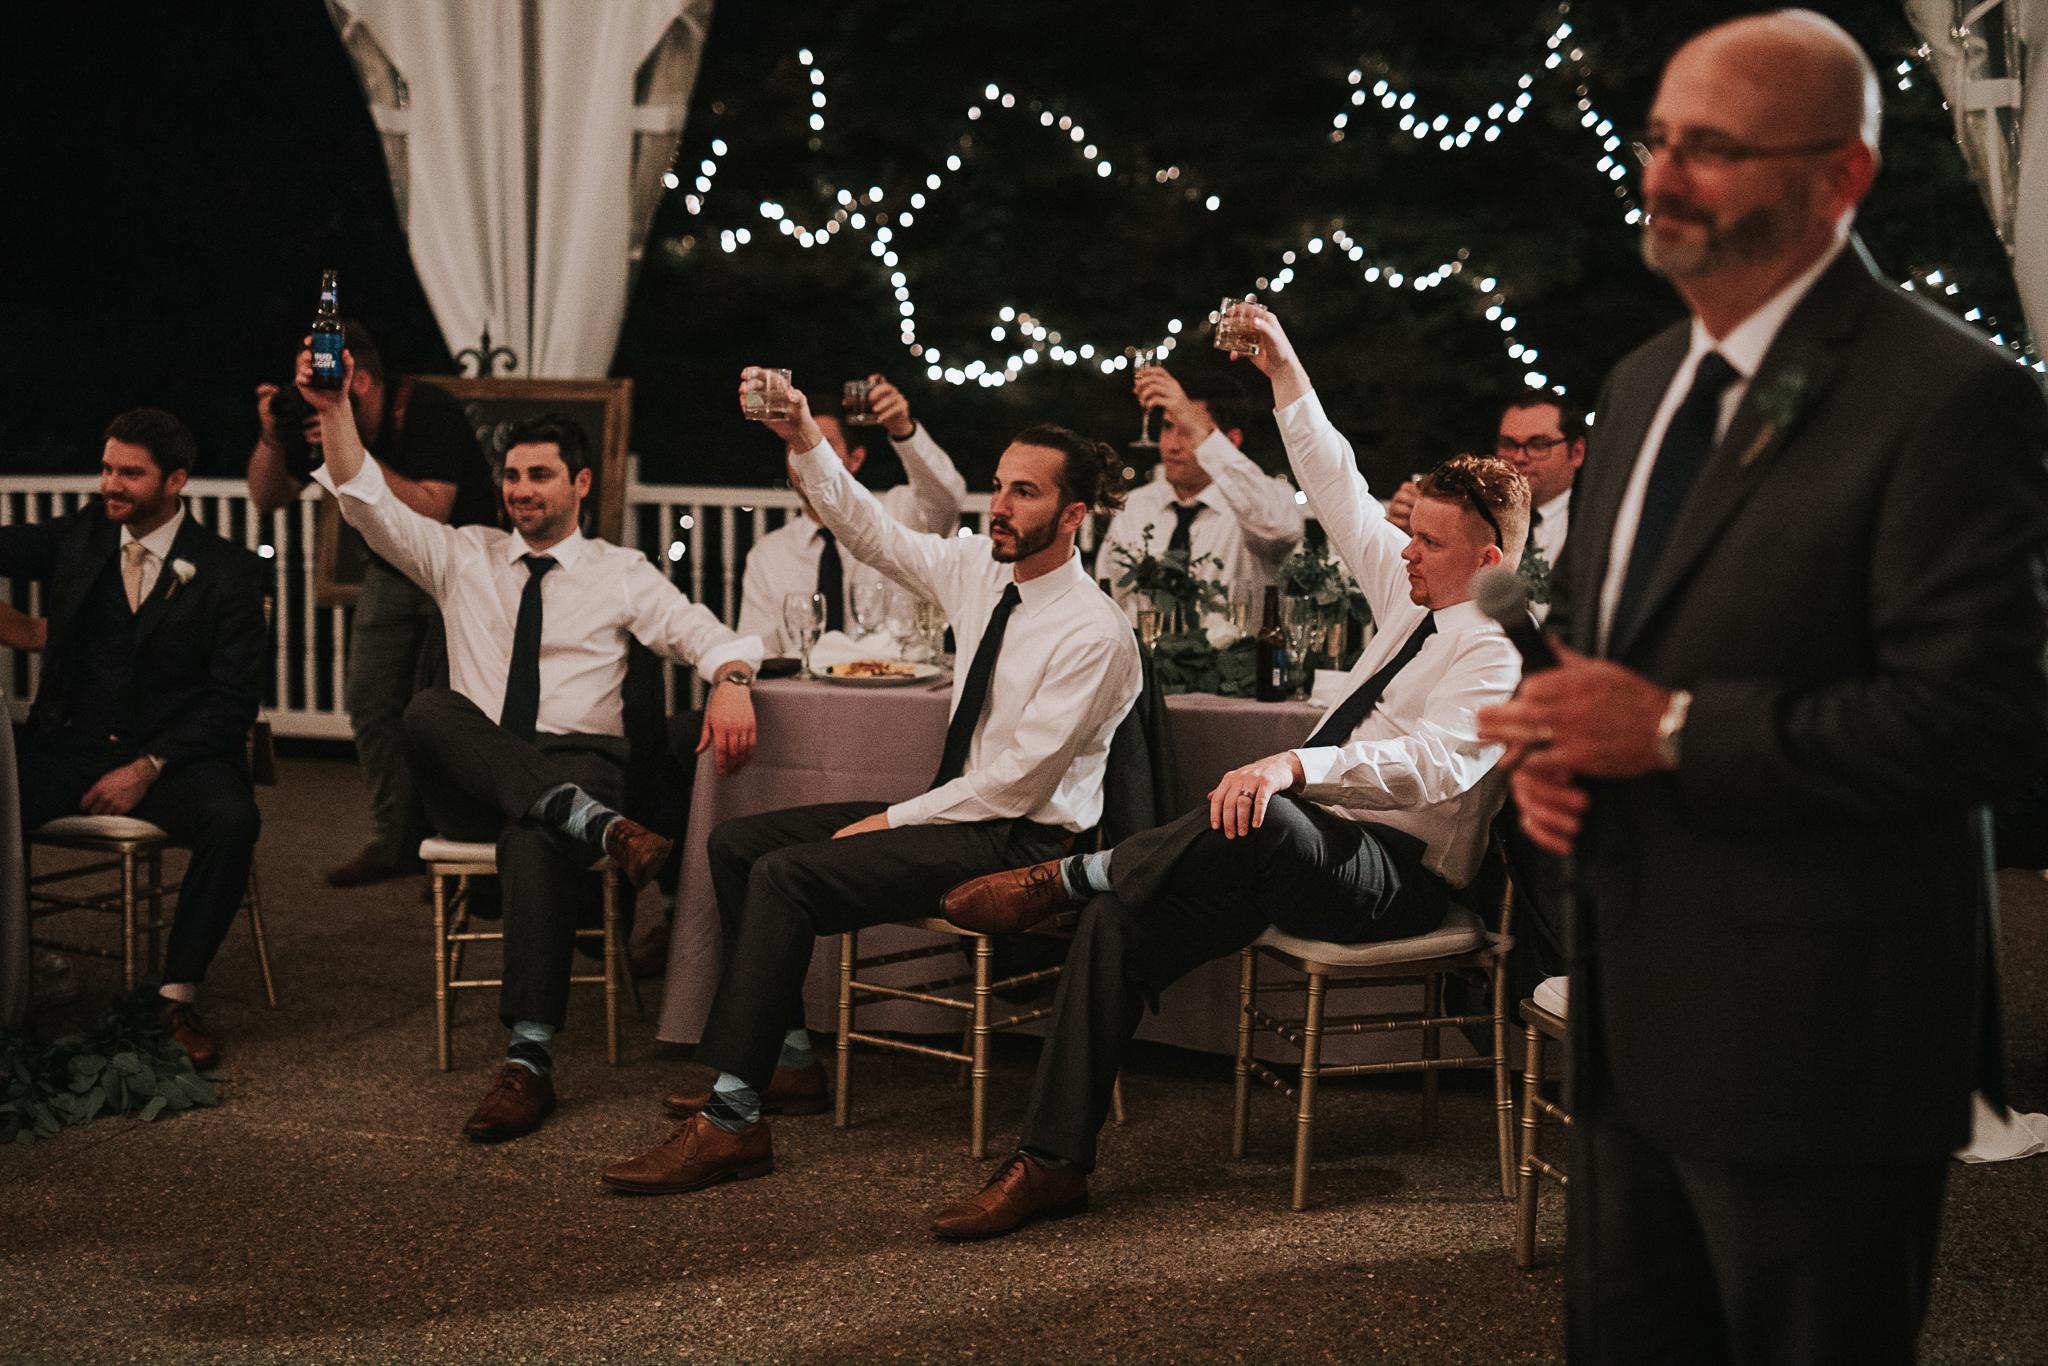 riverwood-mansion-wedding-photos-nashville-tn-10.jpg